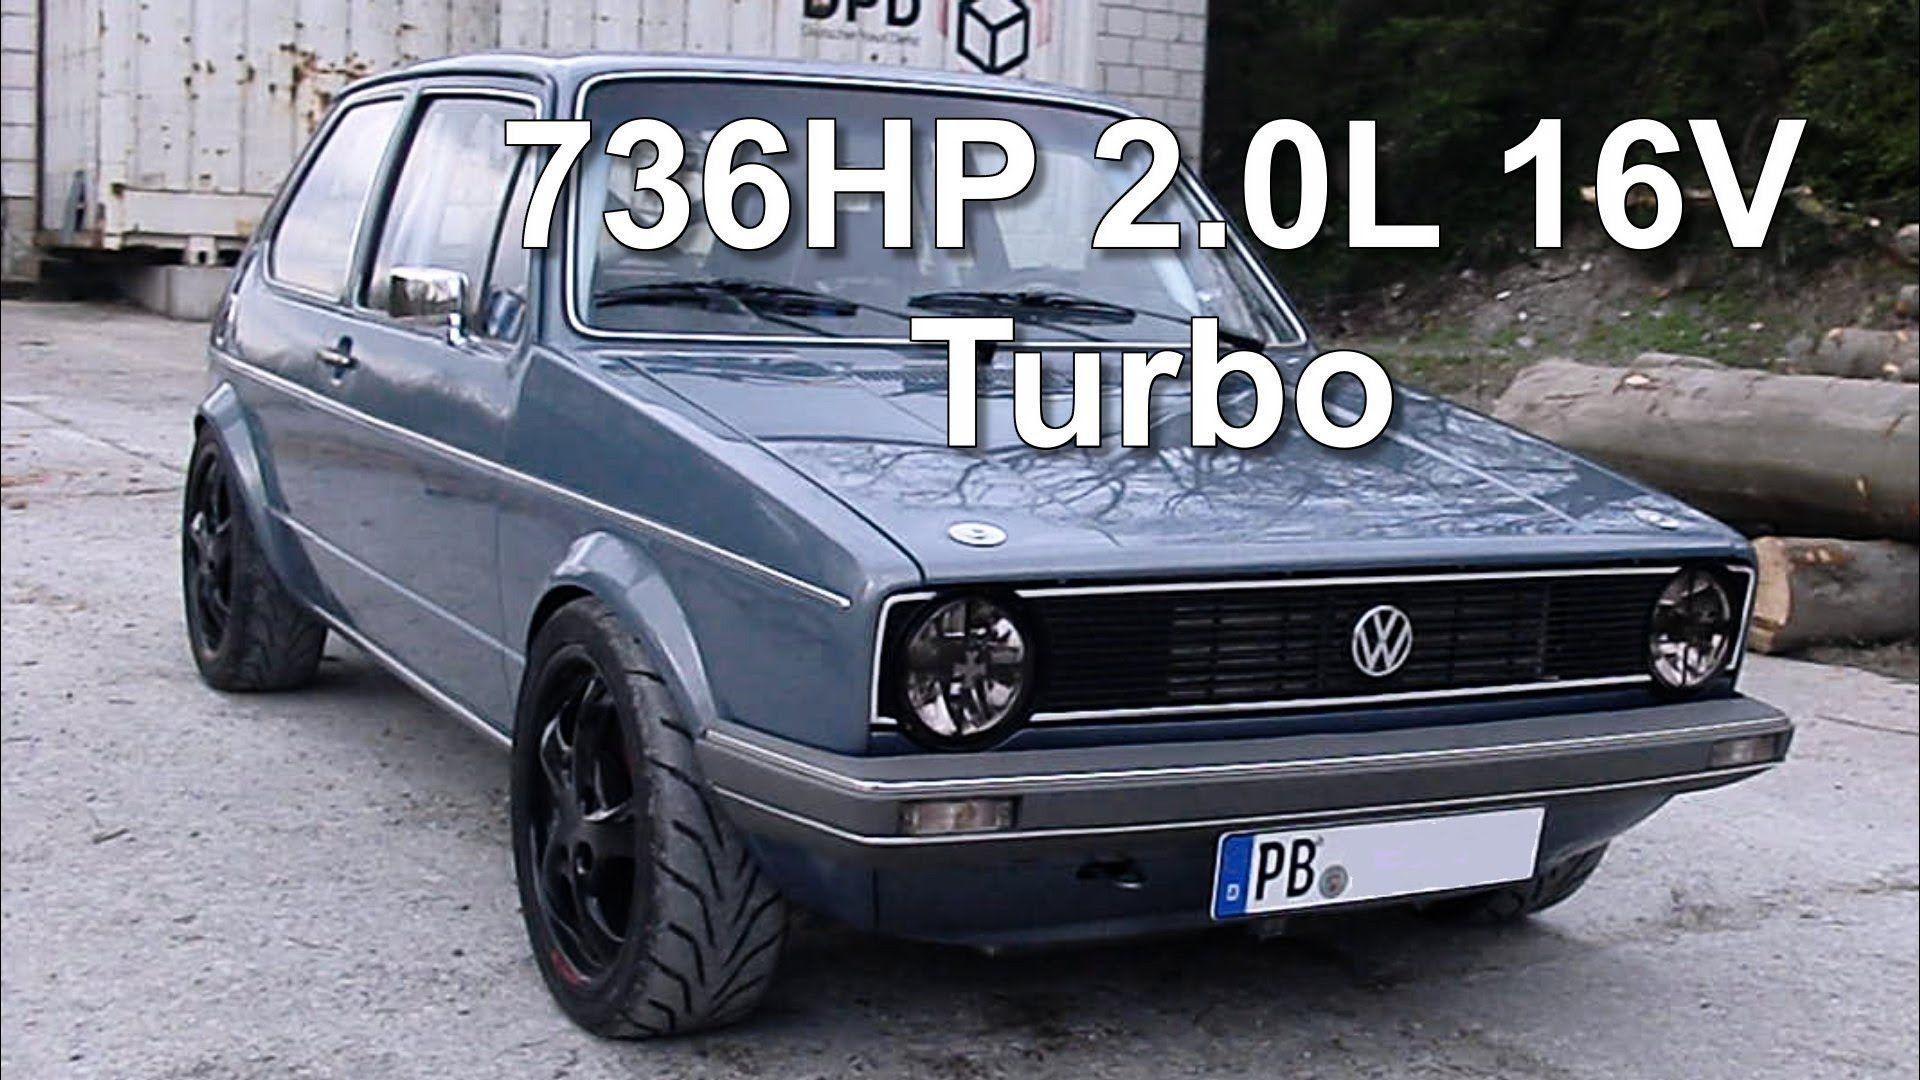 vw golf mk1 736hp 2 0l 16v turbo street race via youtube. Black Bedroom Furniture Sets. Home Design Ideas